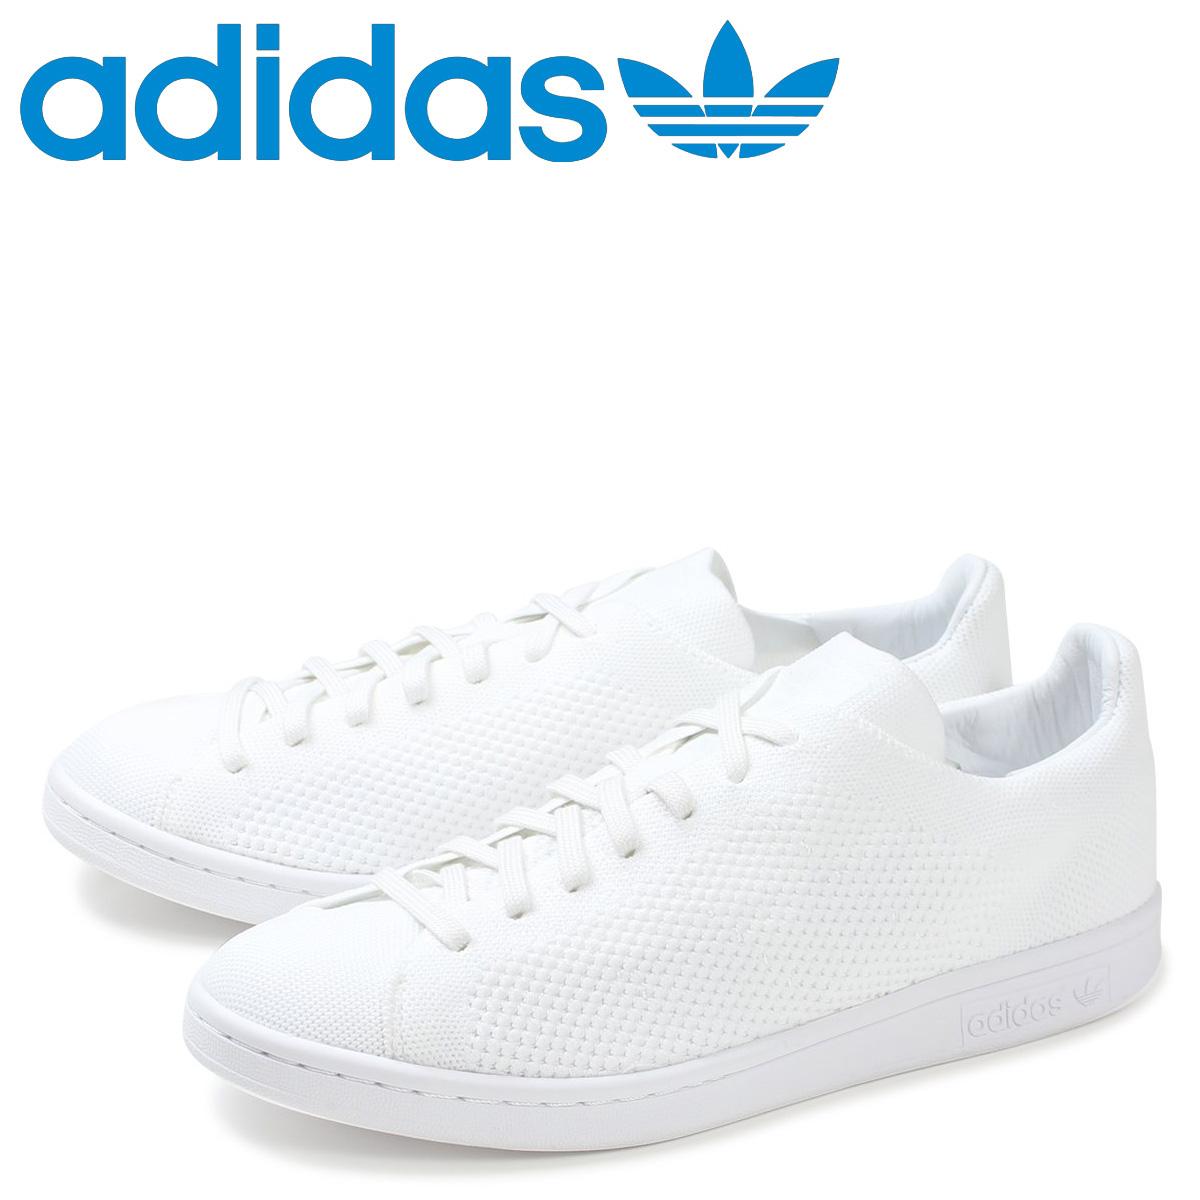 low priced 1c1d4 5ebaa adidas Originals Adidas originals Stan Smith sneakers men STAN SMITH  PRIMEKNIT white white BB3786